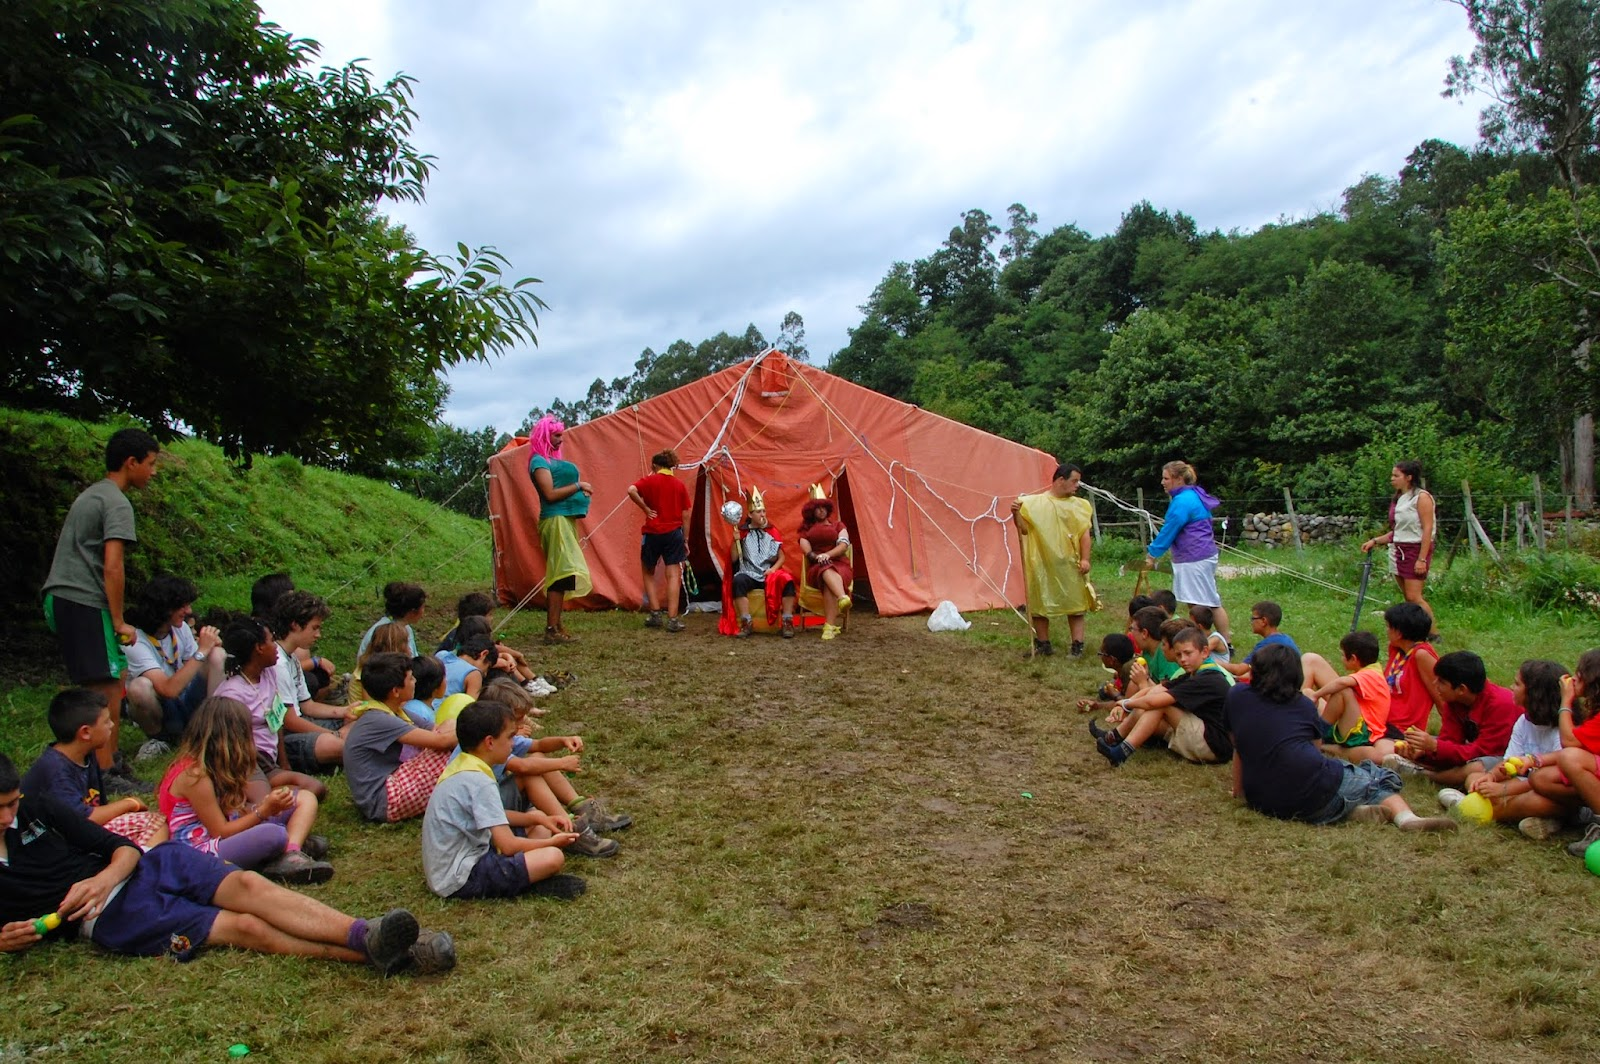 Campaments Estiu RolandKing 2011 - DSC_0255.JPG